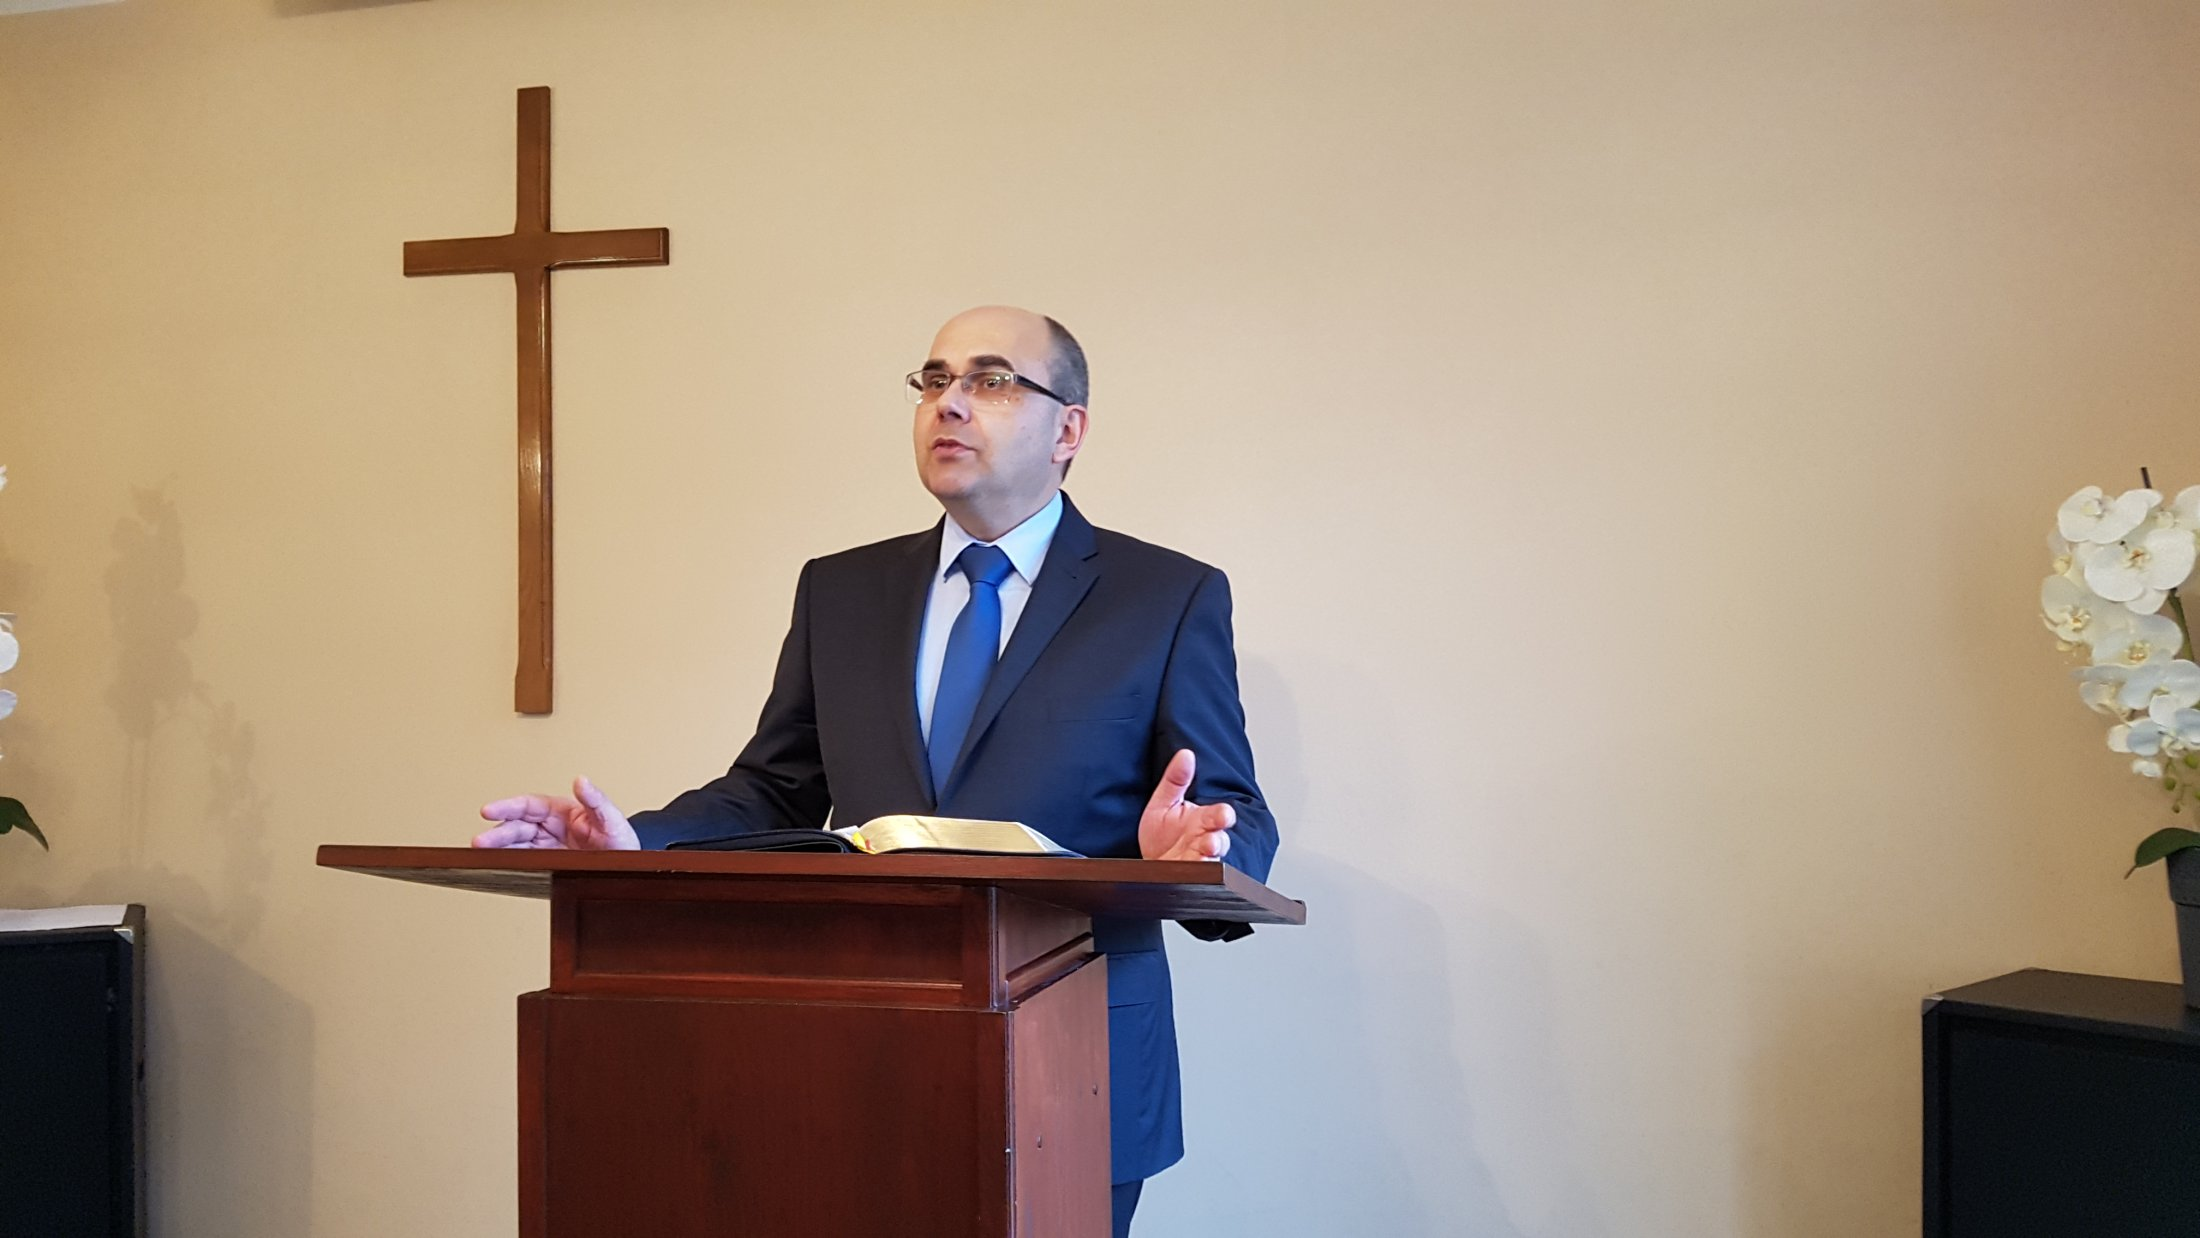 Pastor Mariusz Zaborowski